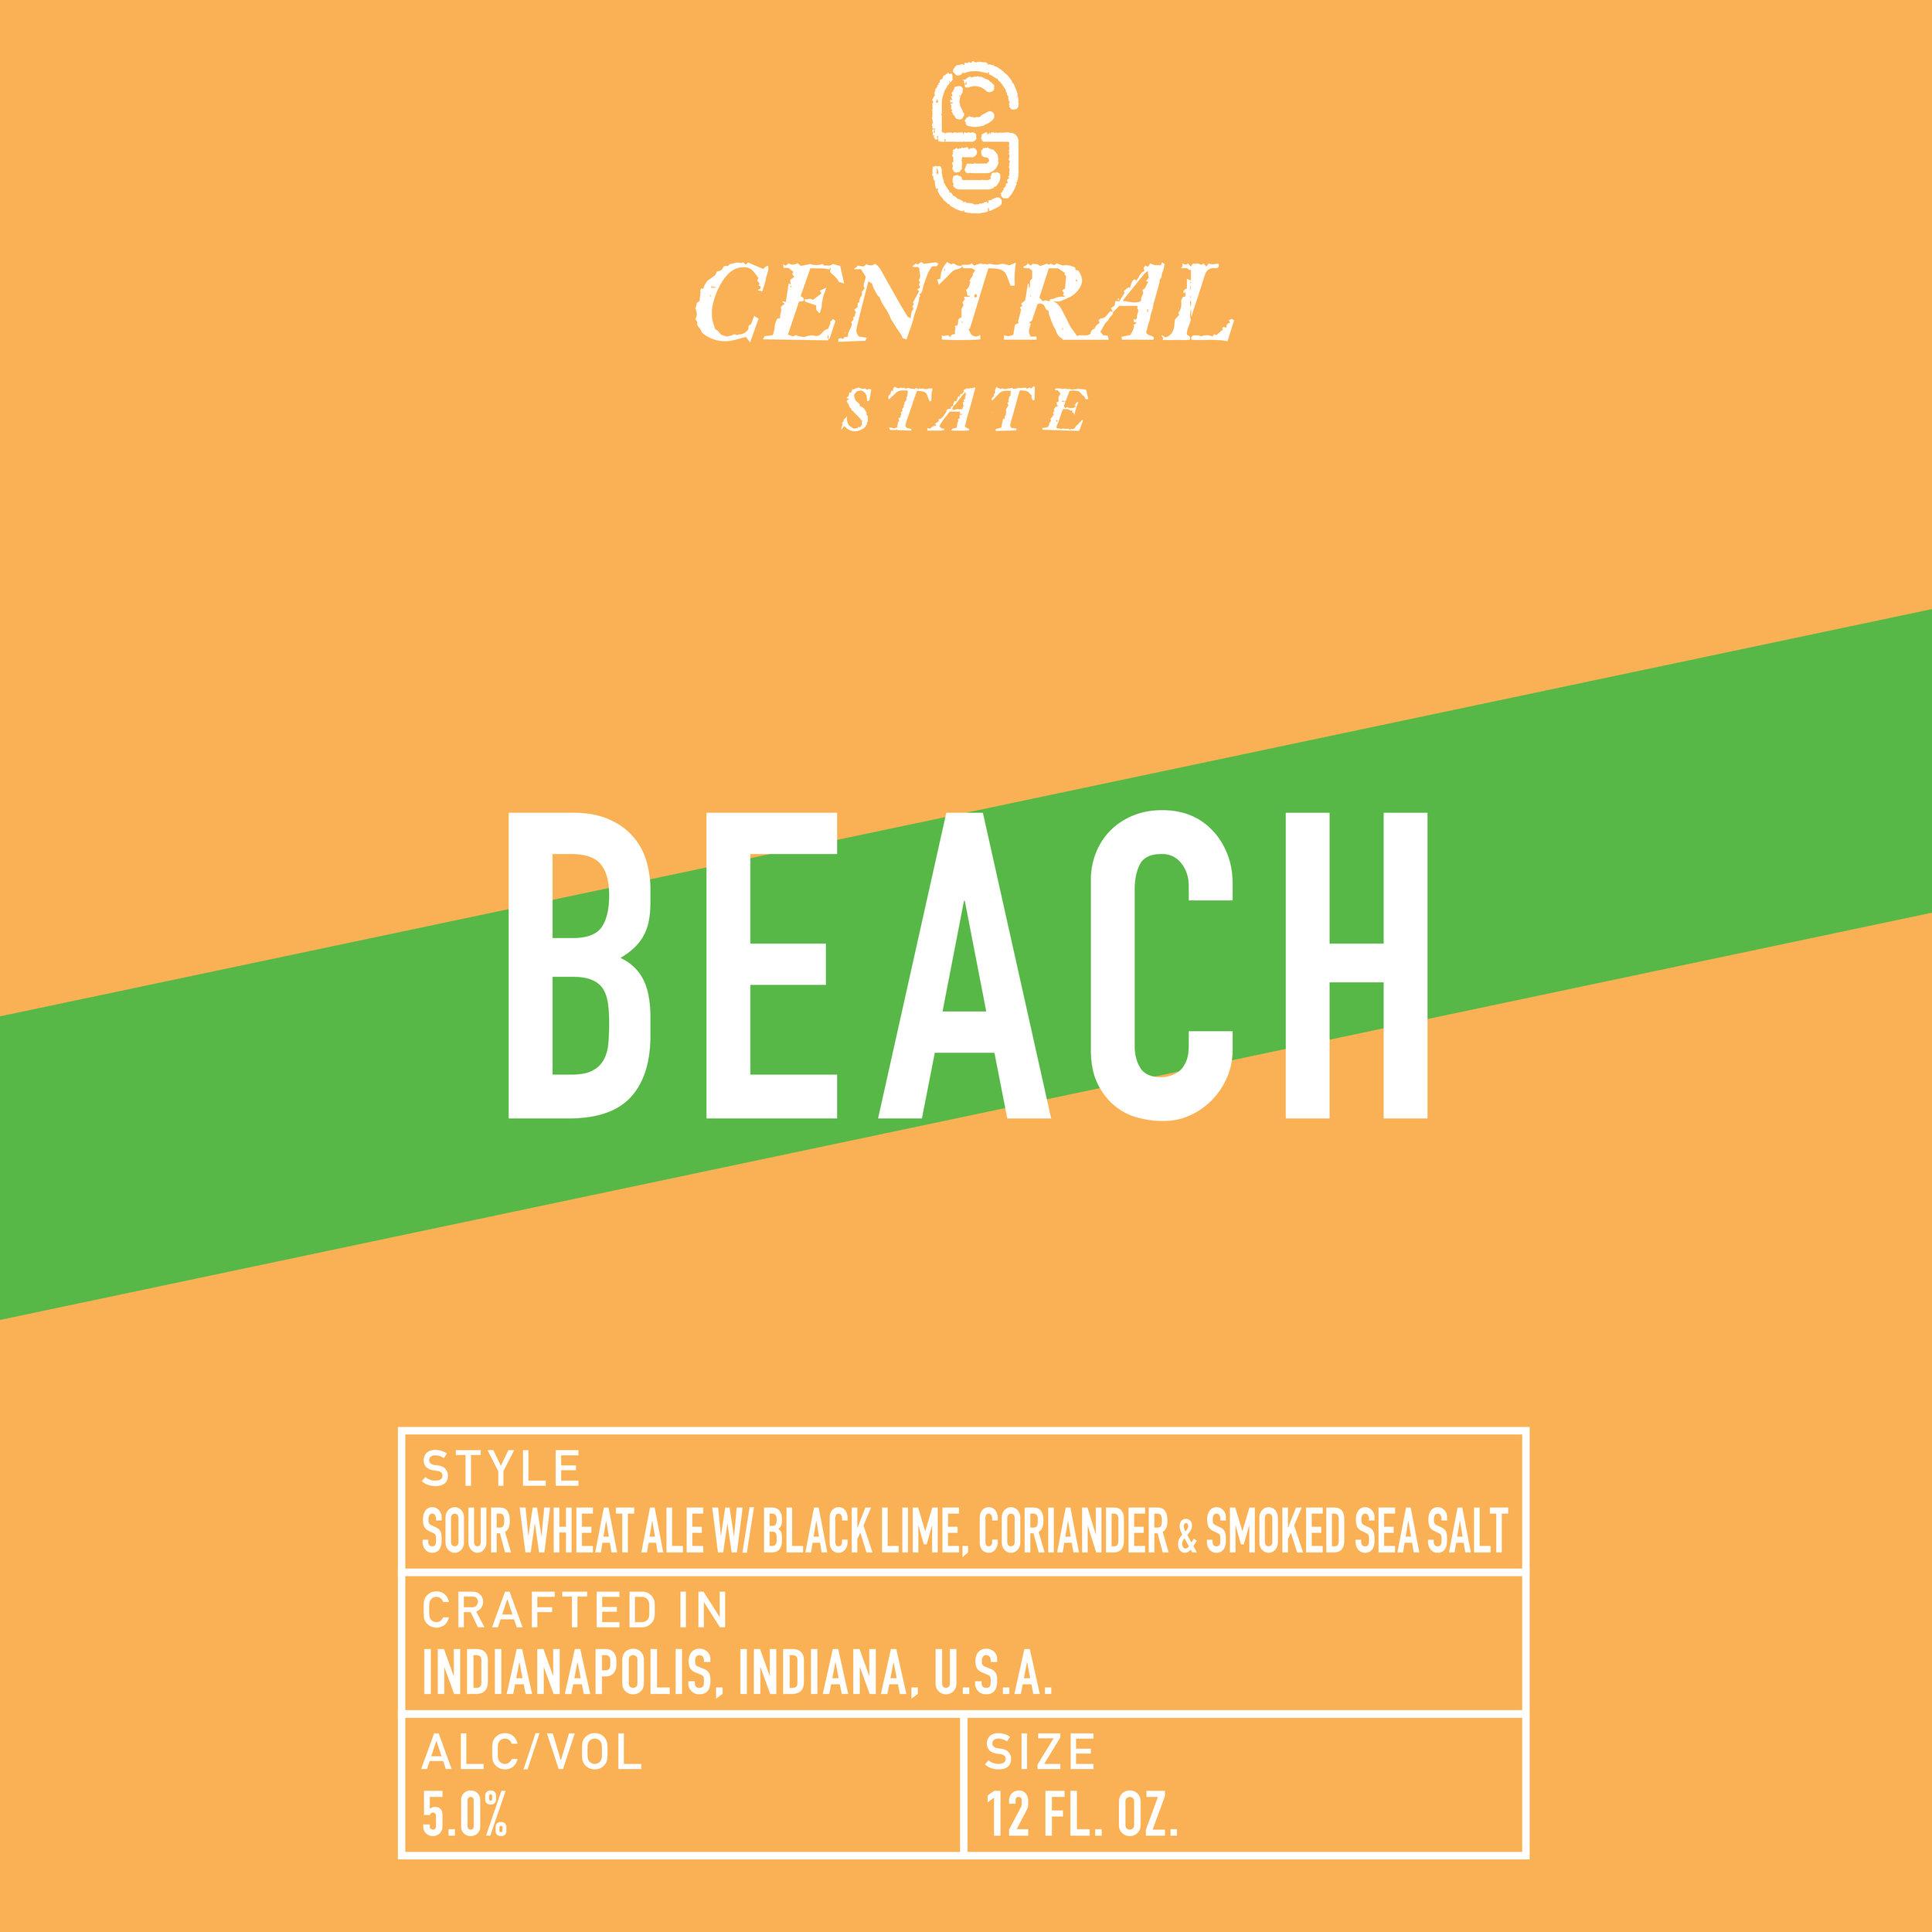 Beach_Social_2.jpg